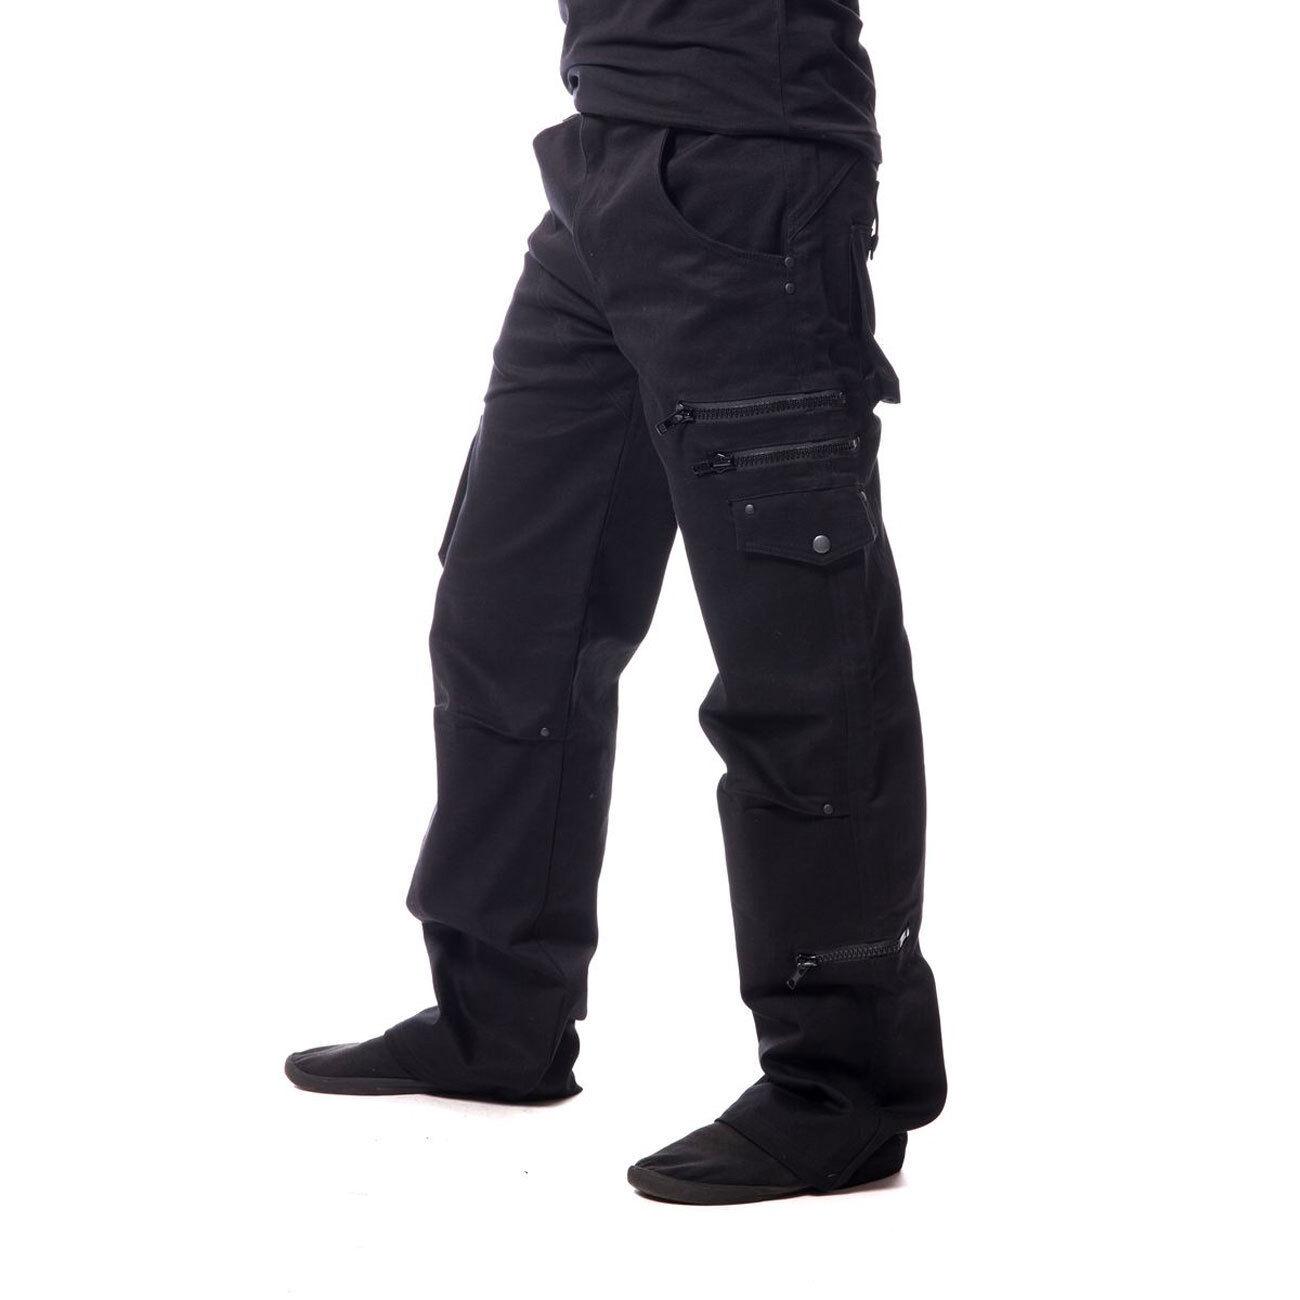 ViXXsin LEON PANTS Gothic Hose viele Taschen Freizeithose Punk schwarz Zipper